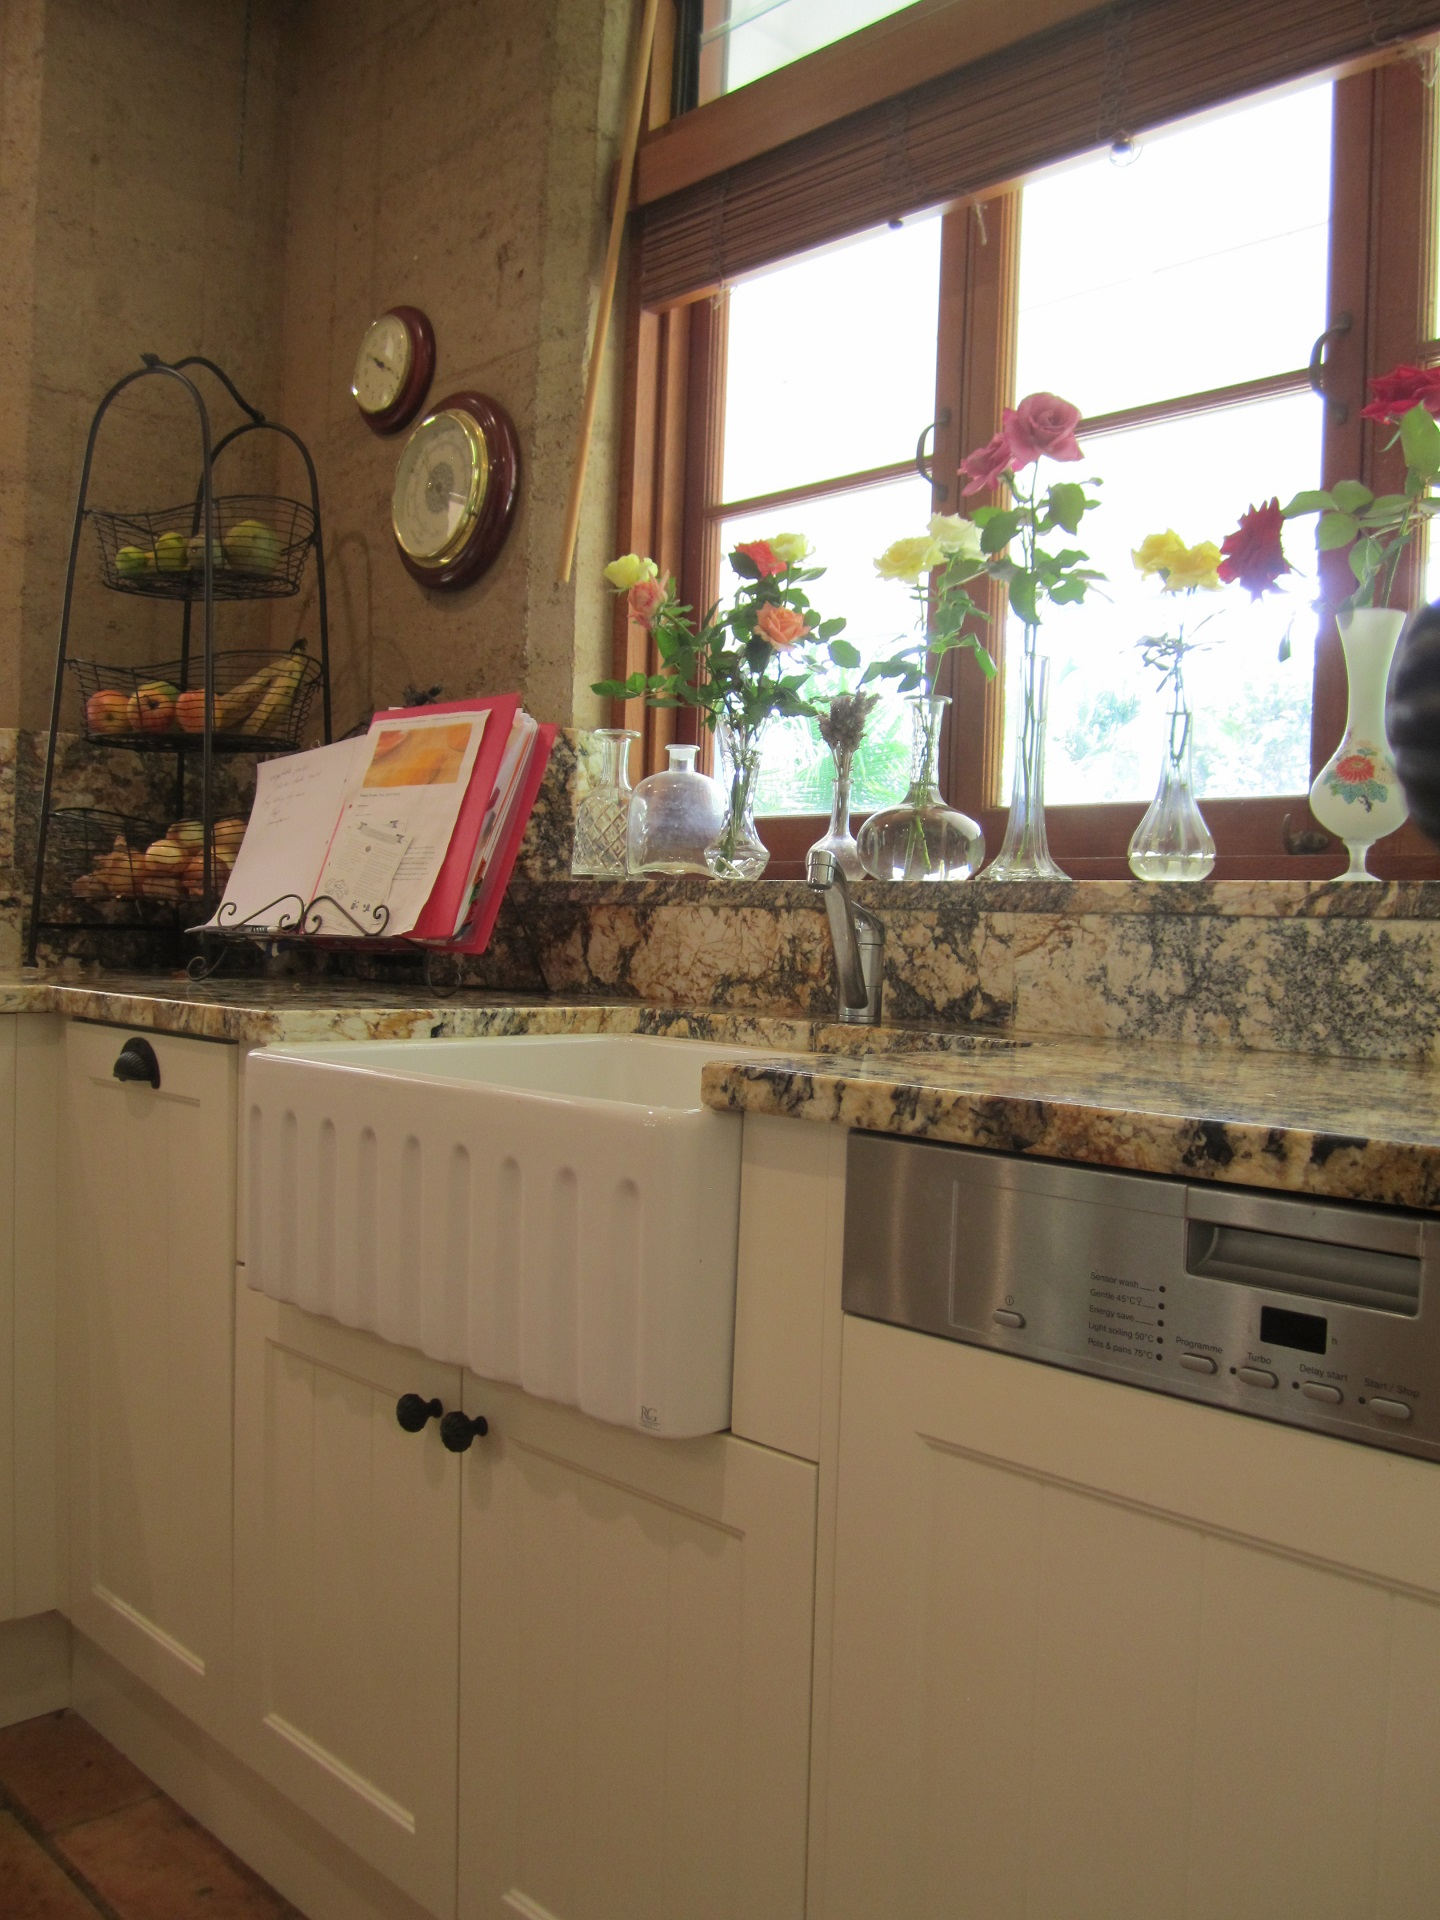 Brisbane Kitchen Design Samford Traditional Kitchen Belfast Sink Semi Integrated Dishwasher1